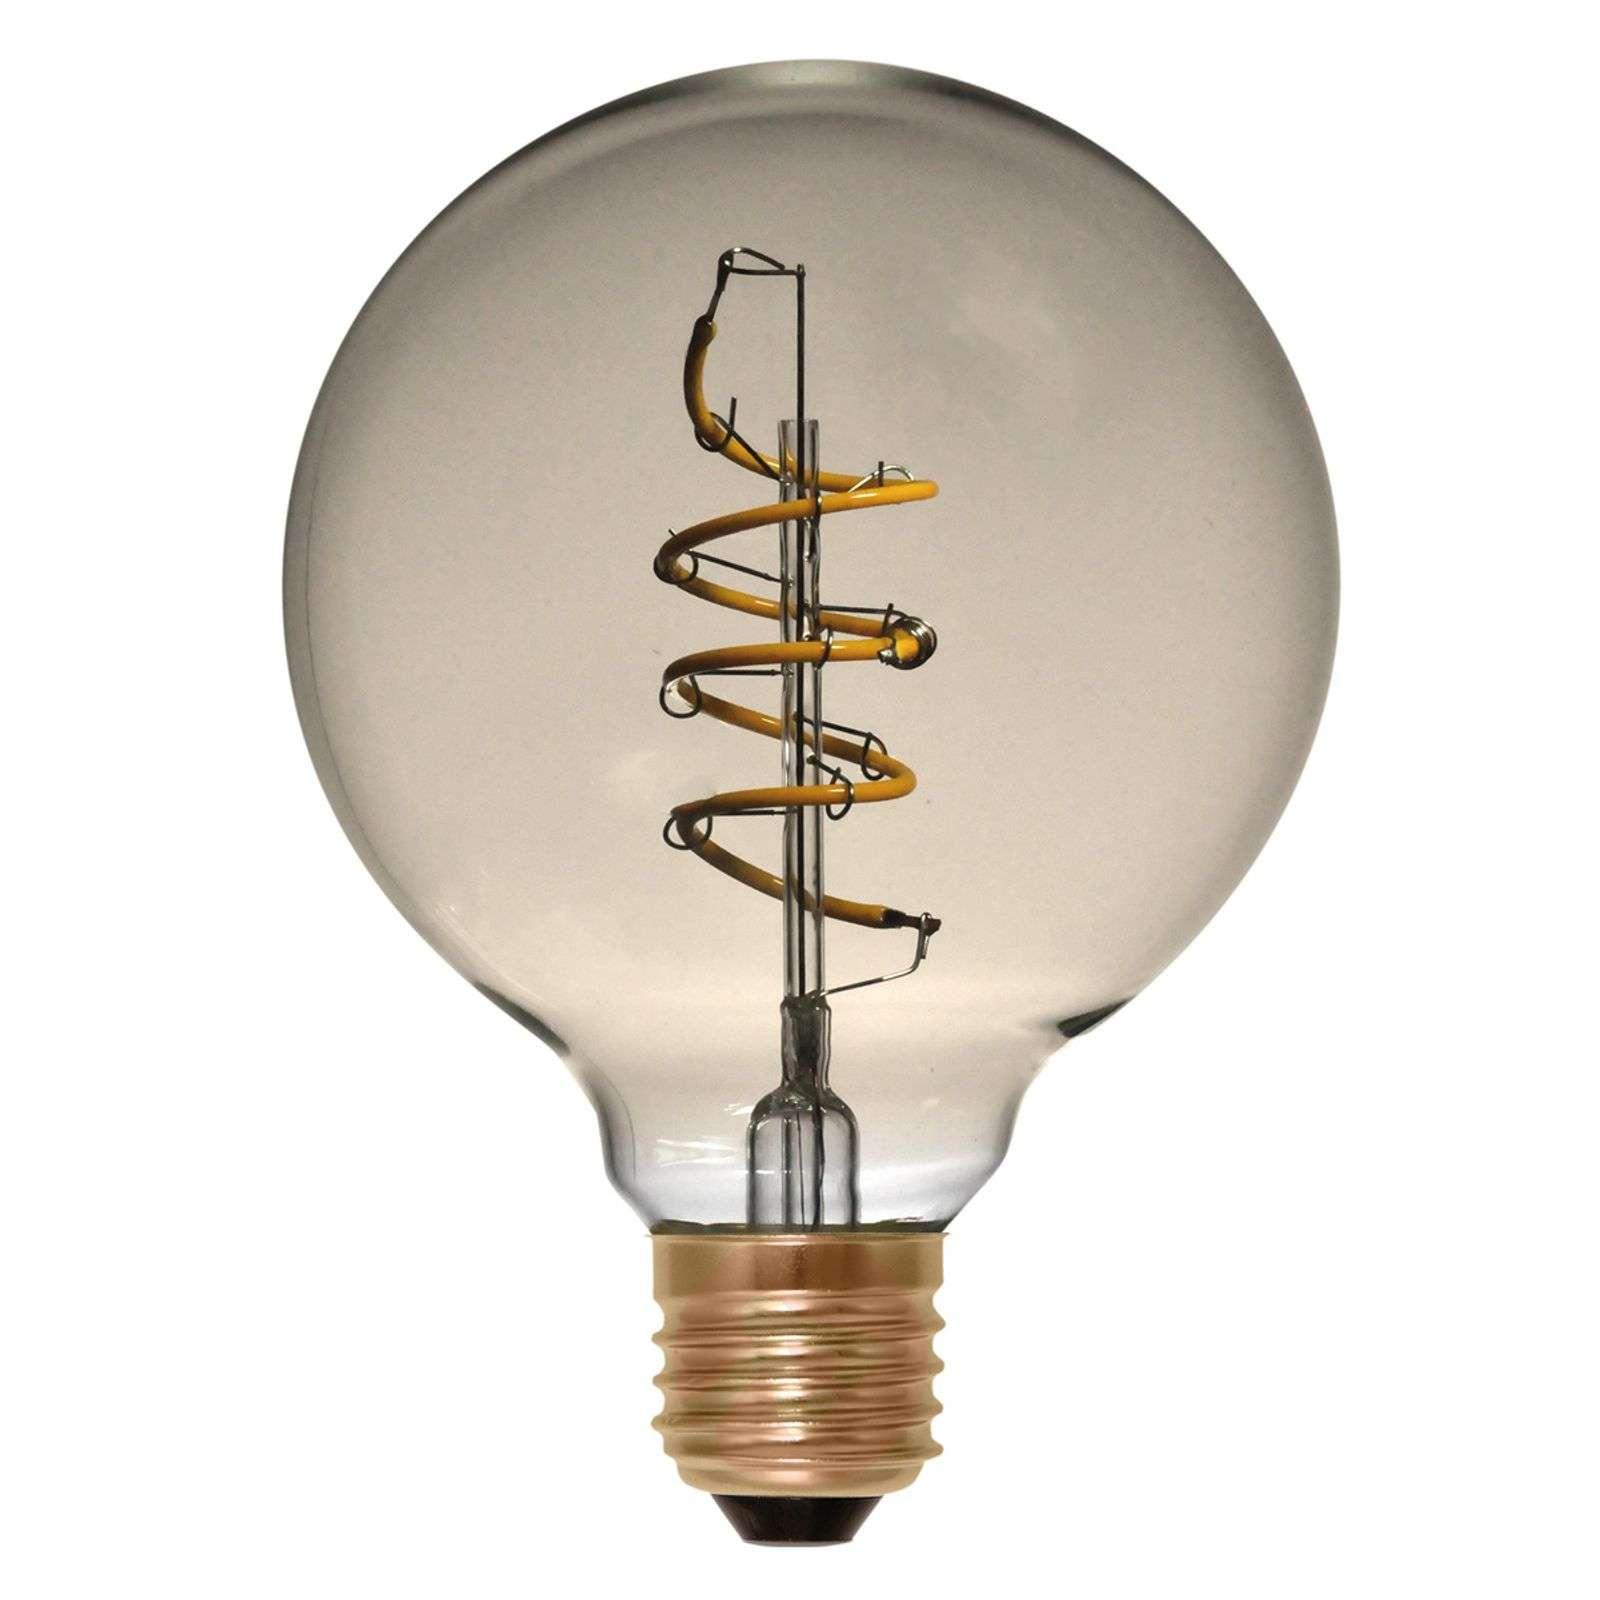 LED-pallo G95 E27 4W 922, pysty Curved Line-8536168-02